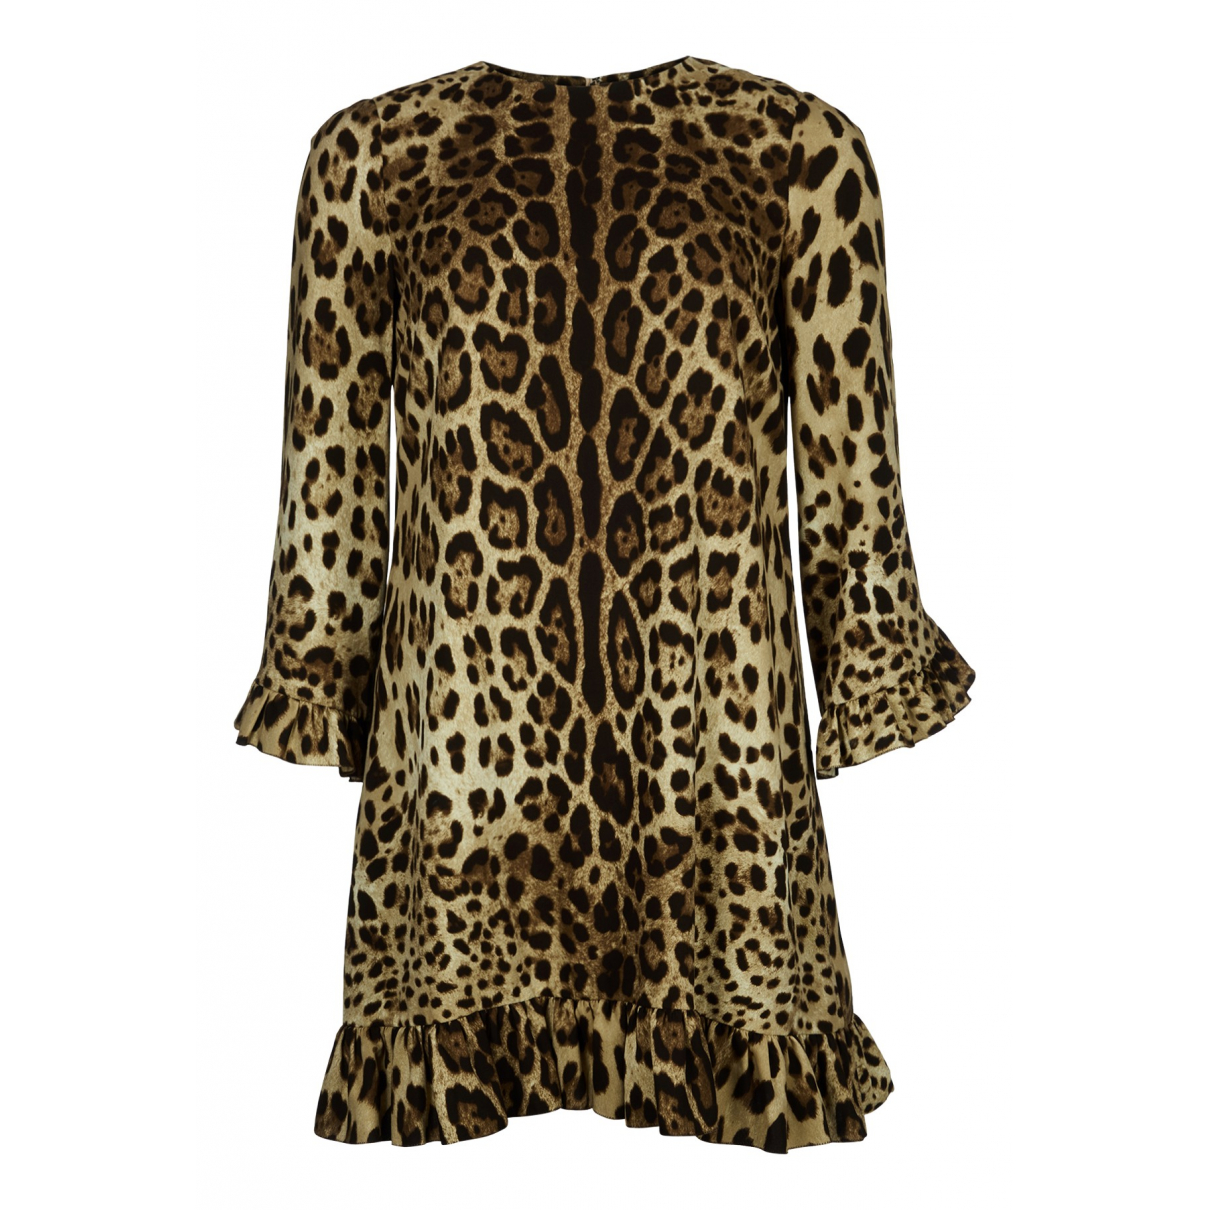 Dolce & Gabbana N Multicolour Silk dress for Women 12 UK